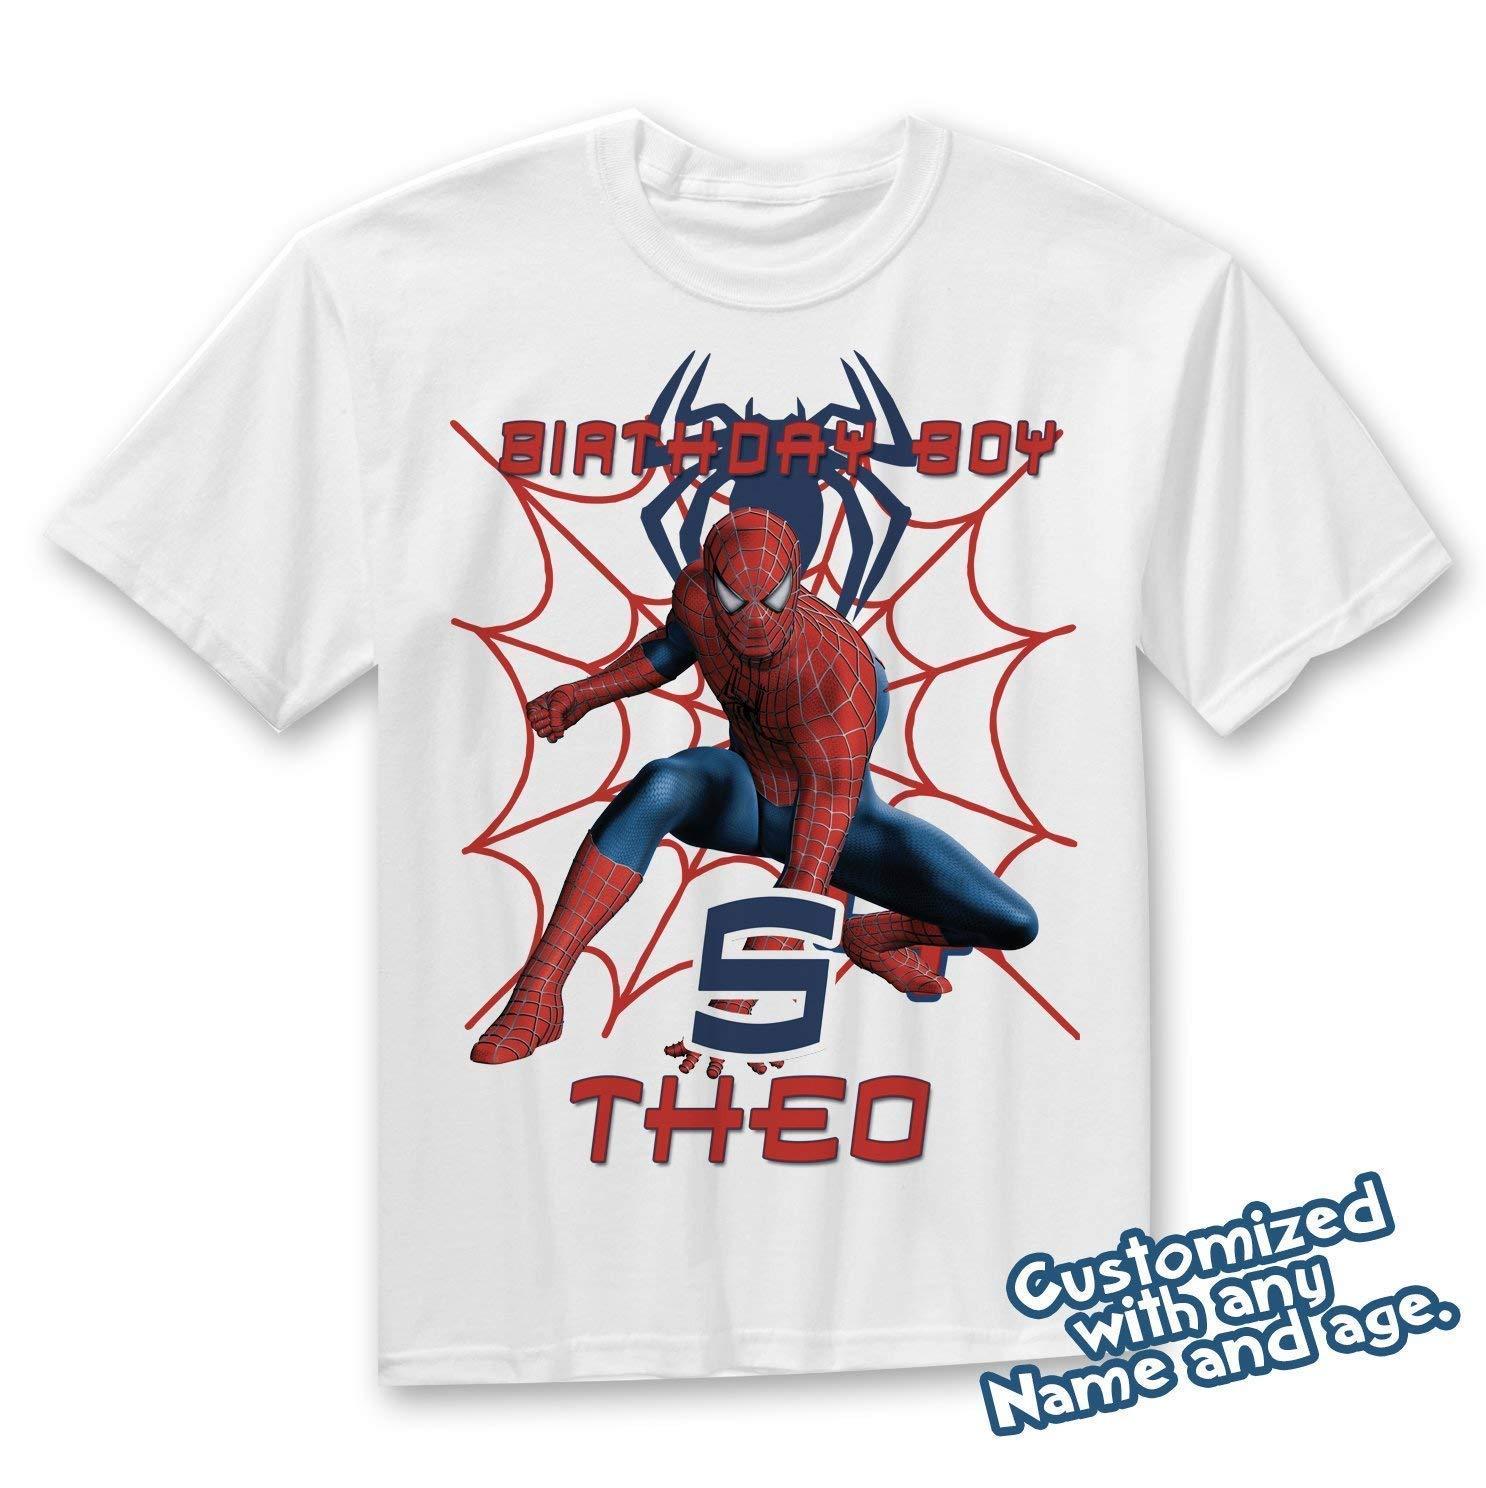 b8d625c32 Amazon.com: Spider-man Birthday Shirt Add Name & Age Spiderman Custom  Birthday Party TShirt: Handmade